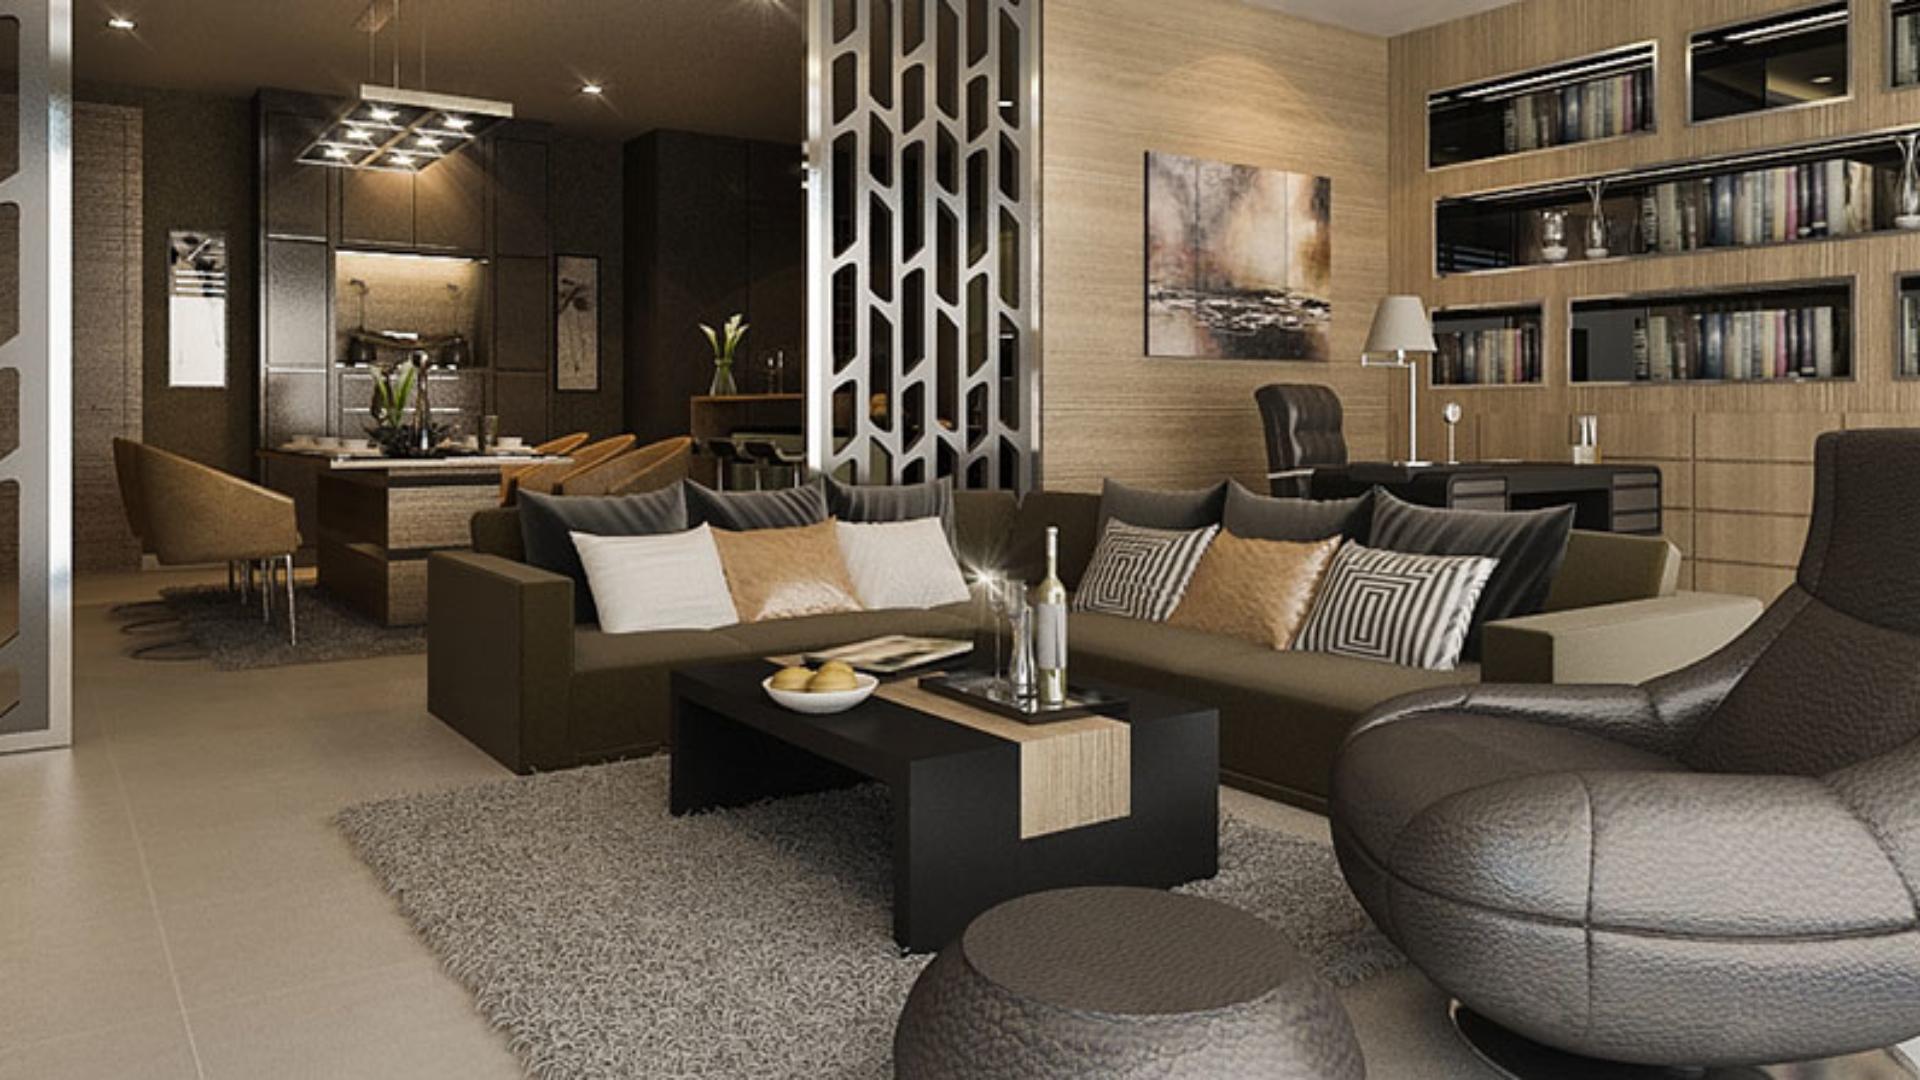 chair design bangkok swing dublin renovation thailand interior